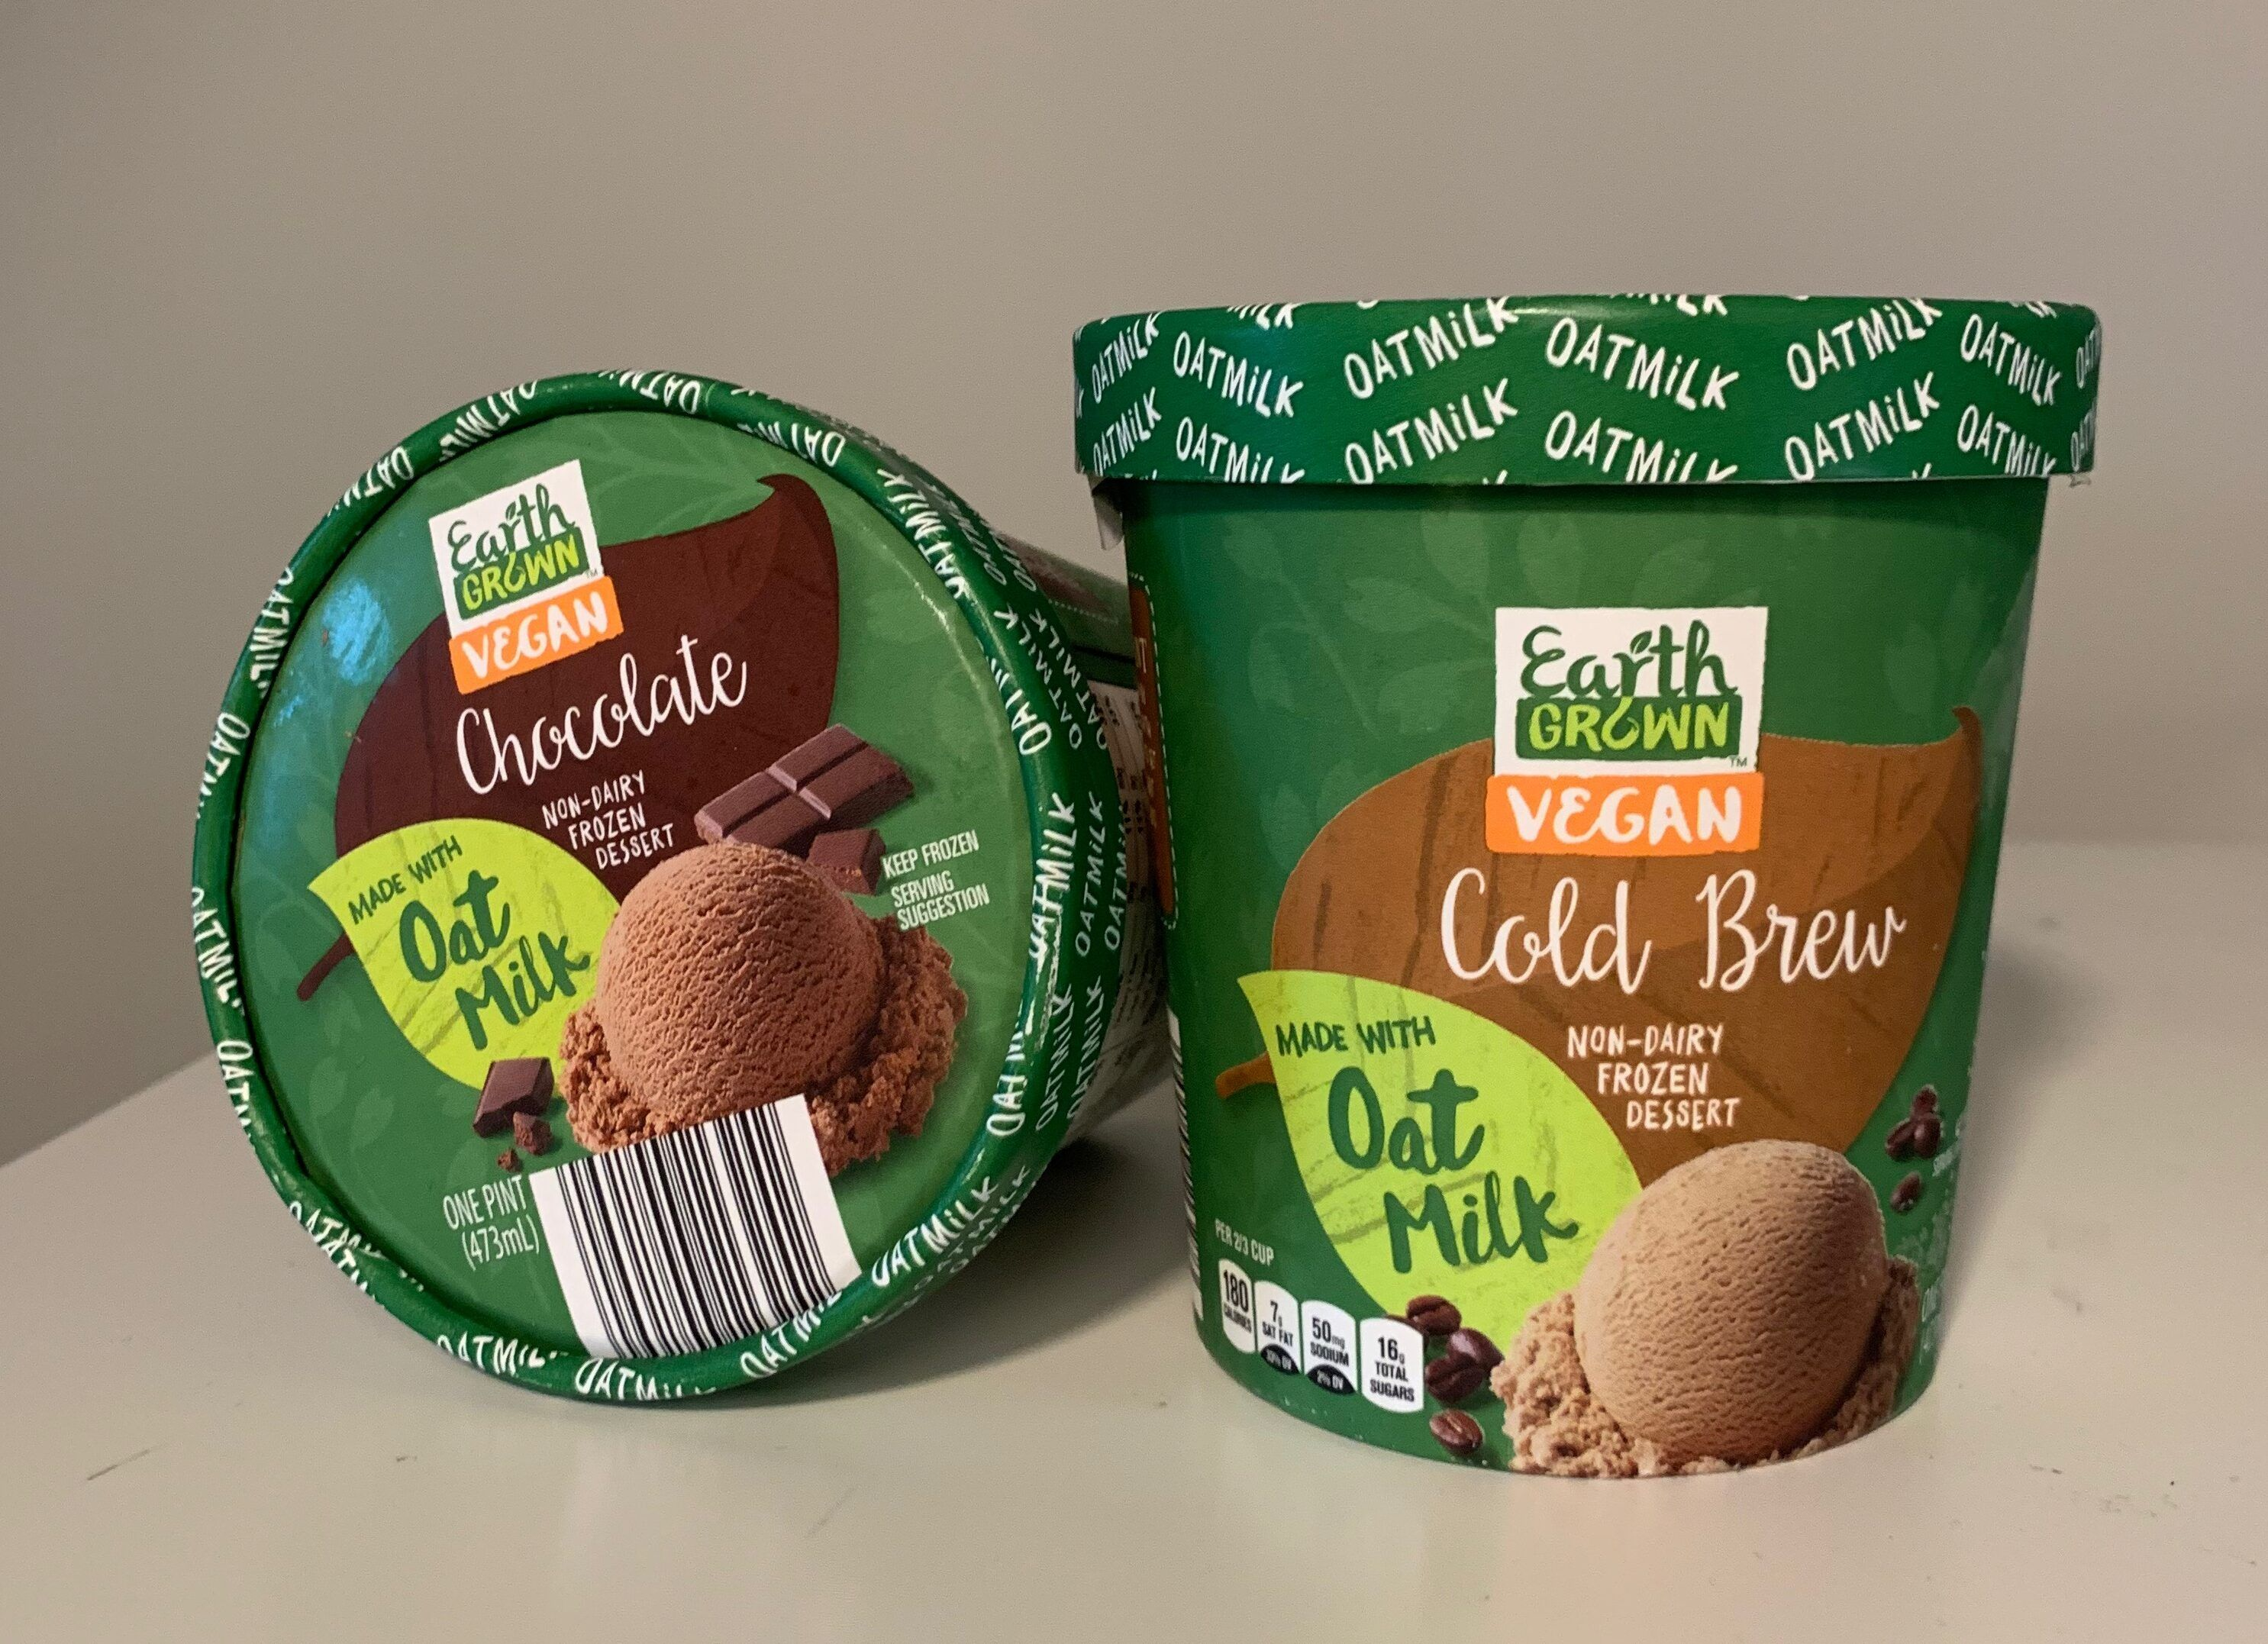 Earth Grown Vegan Non Dairy Frozen Dessert Oat Milk Frozen